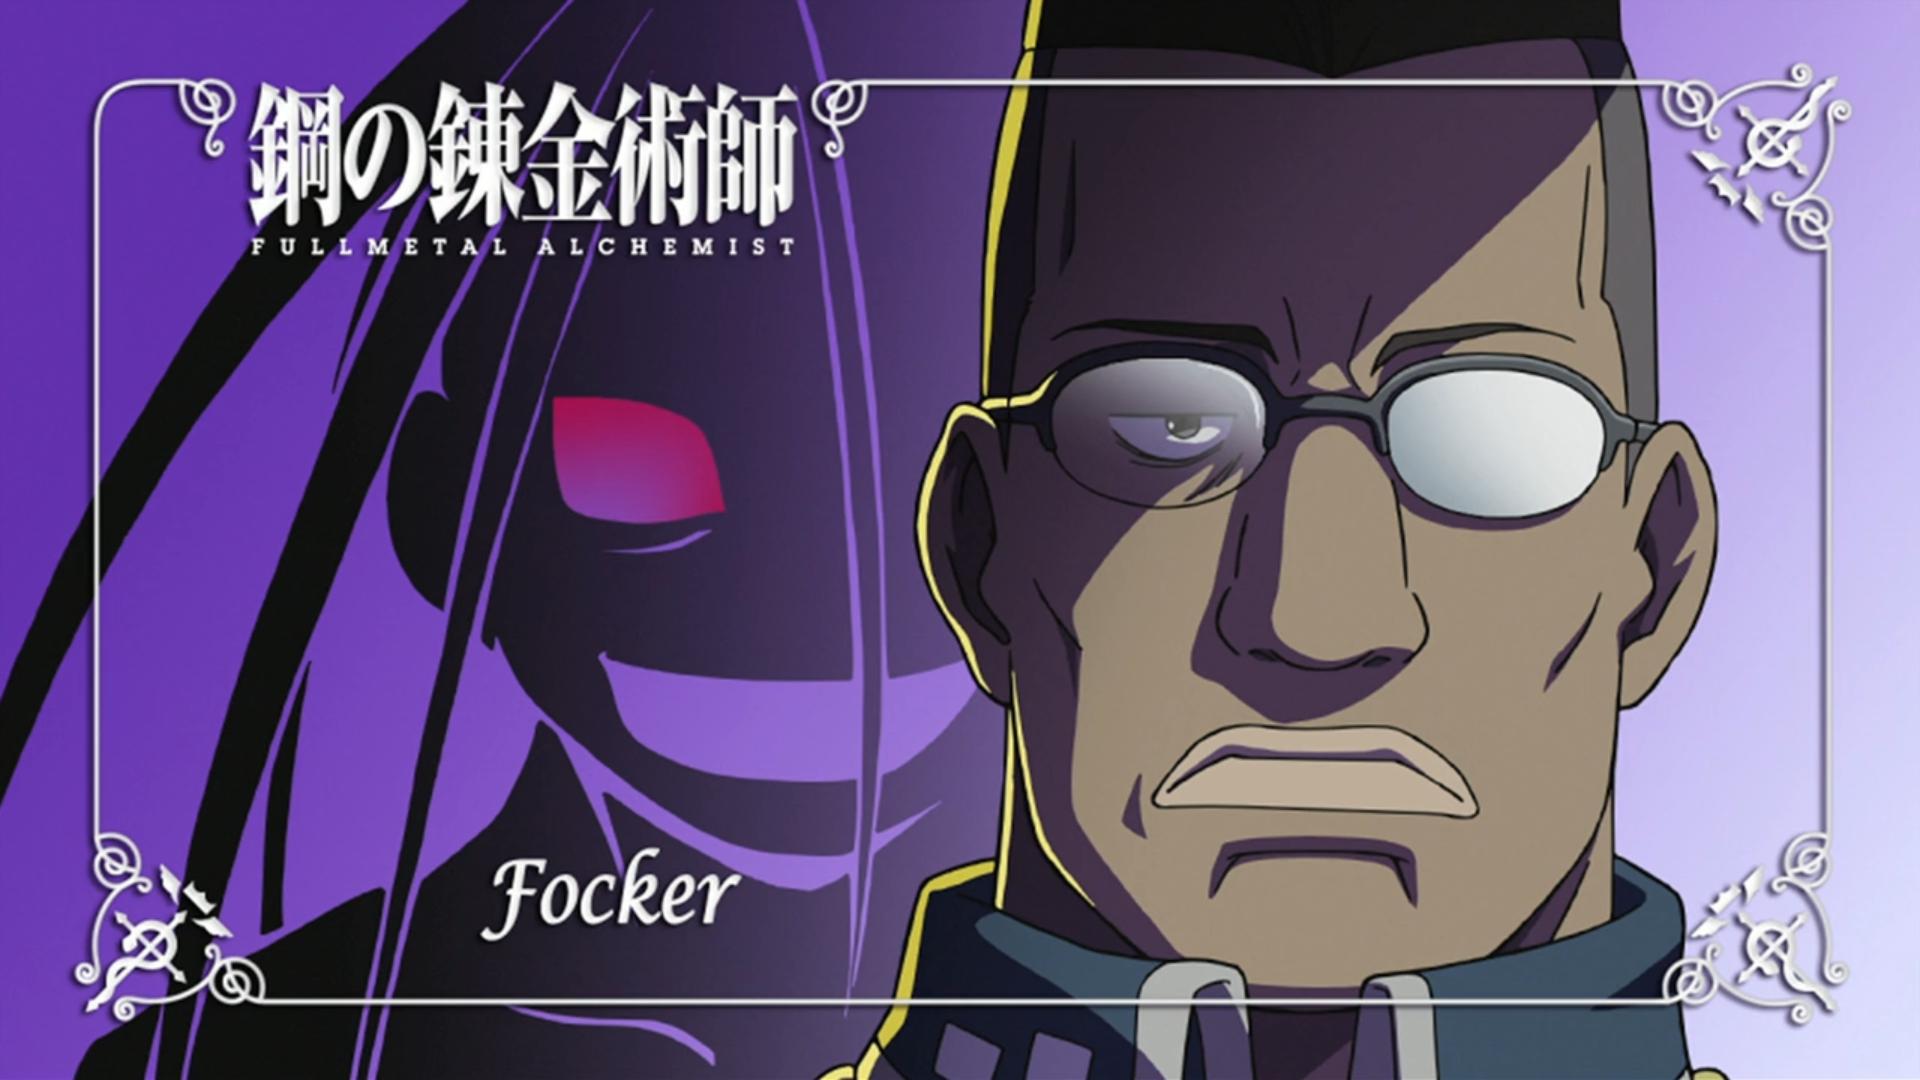 Illustration Anime Cartoon Comics Fullmetal Alchemist Brotherhood Envy Screenshot Mangaka Comic Book Fiction